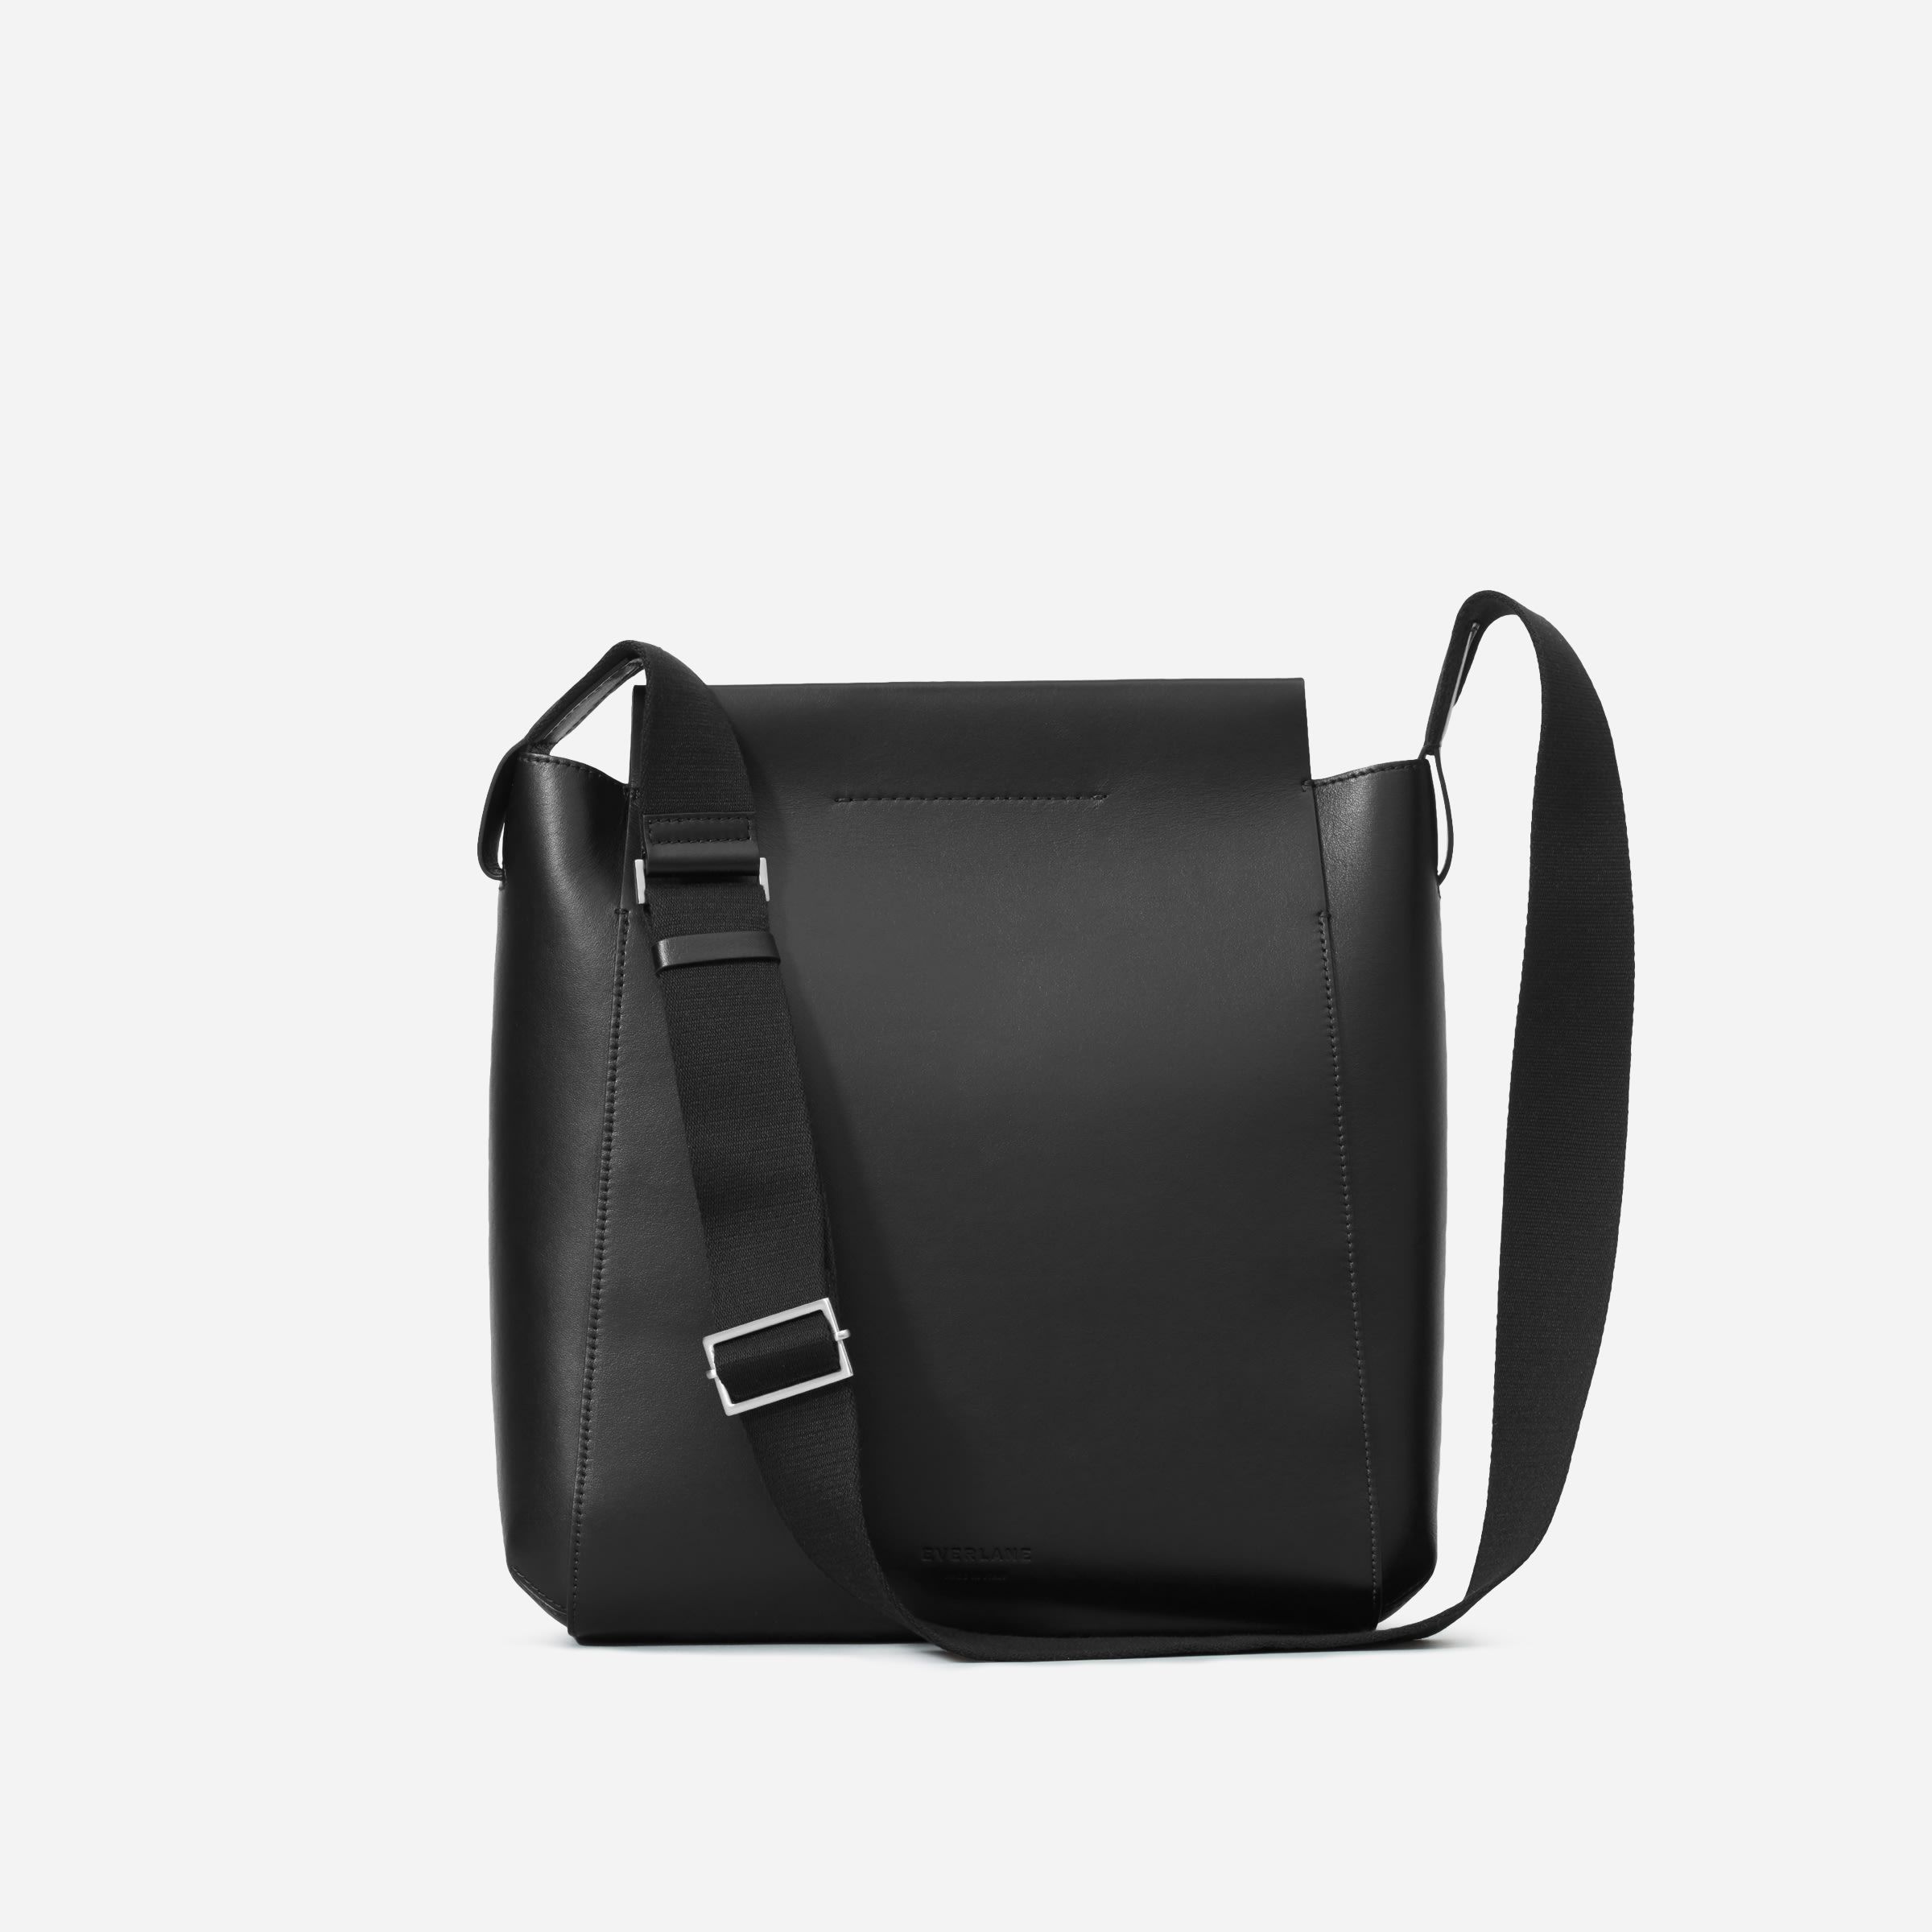 italian made leather messenger bag fenix toulouse handball